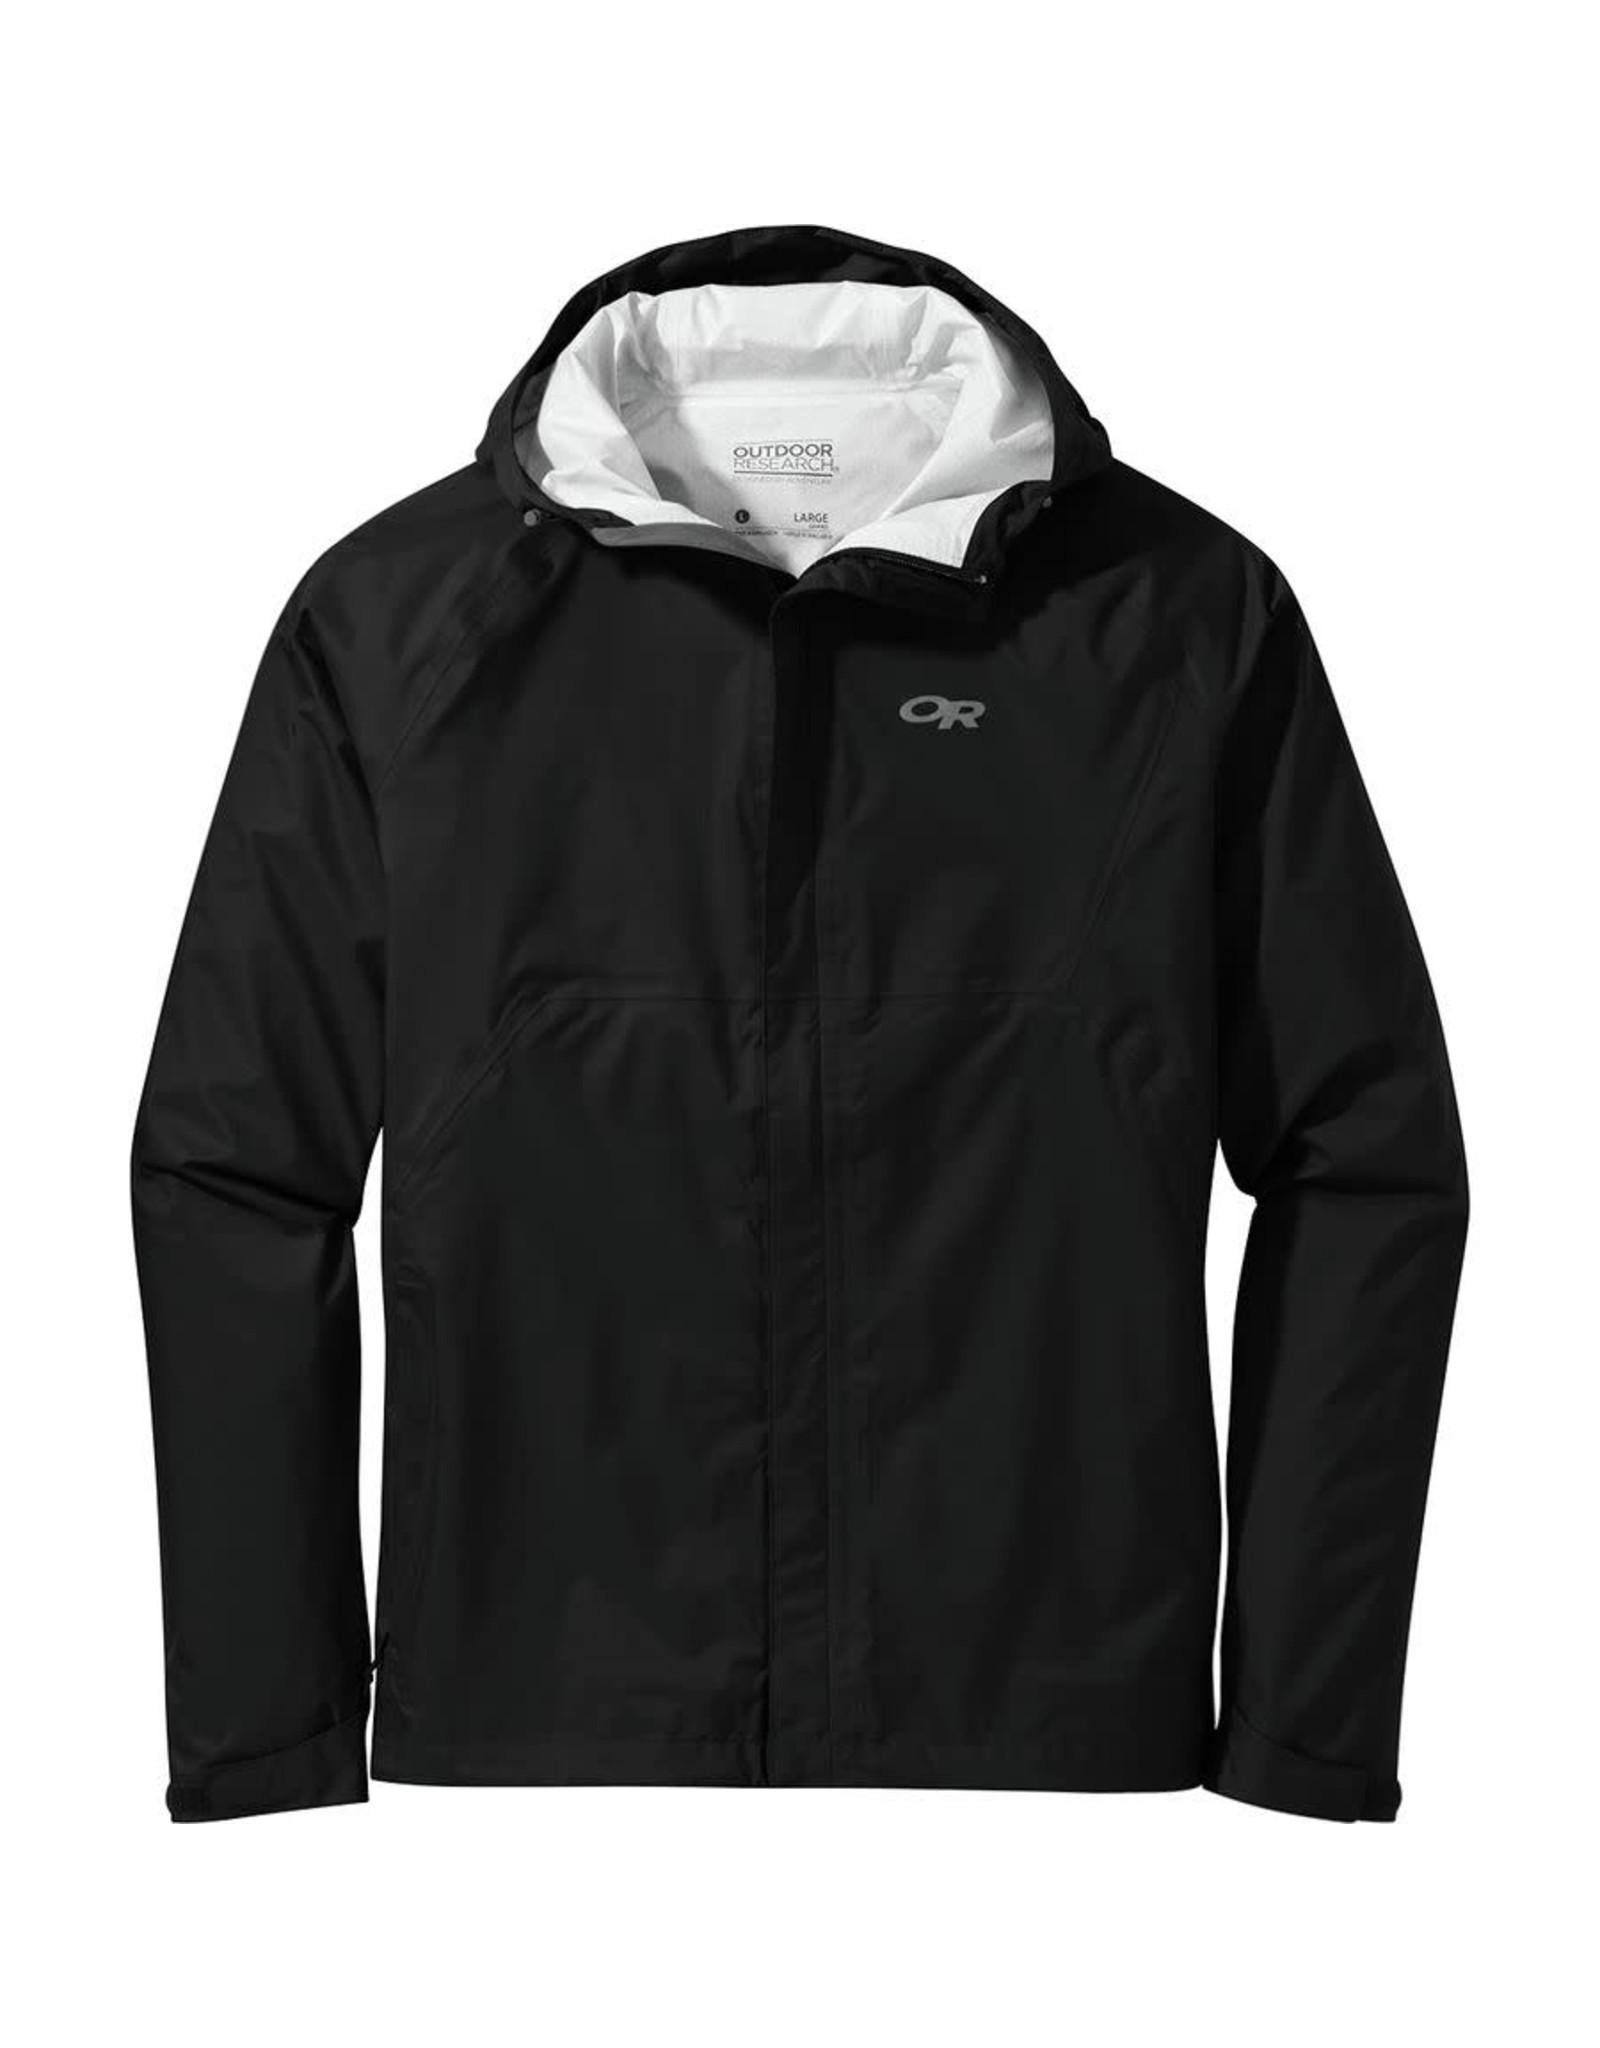 Outdoor Research Outdoor Research Apollo Rain Jacket Black XL